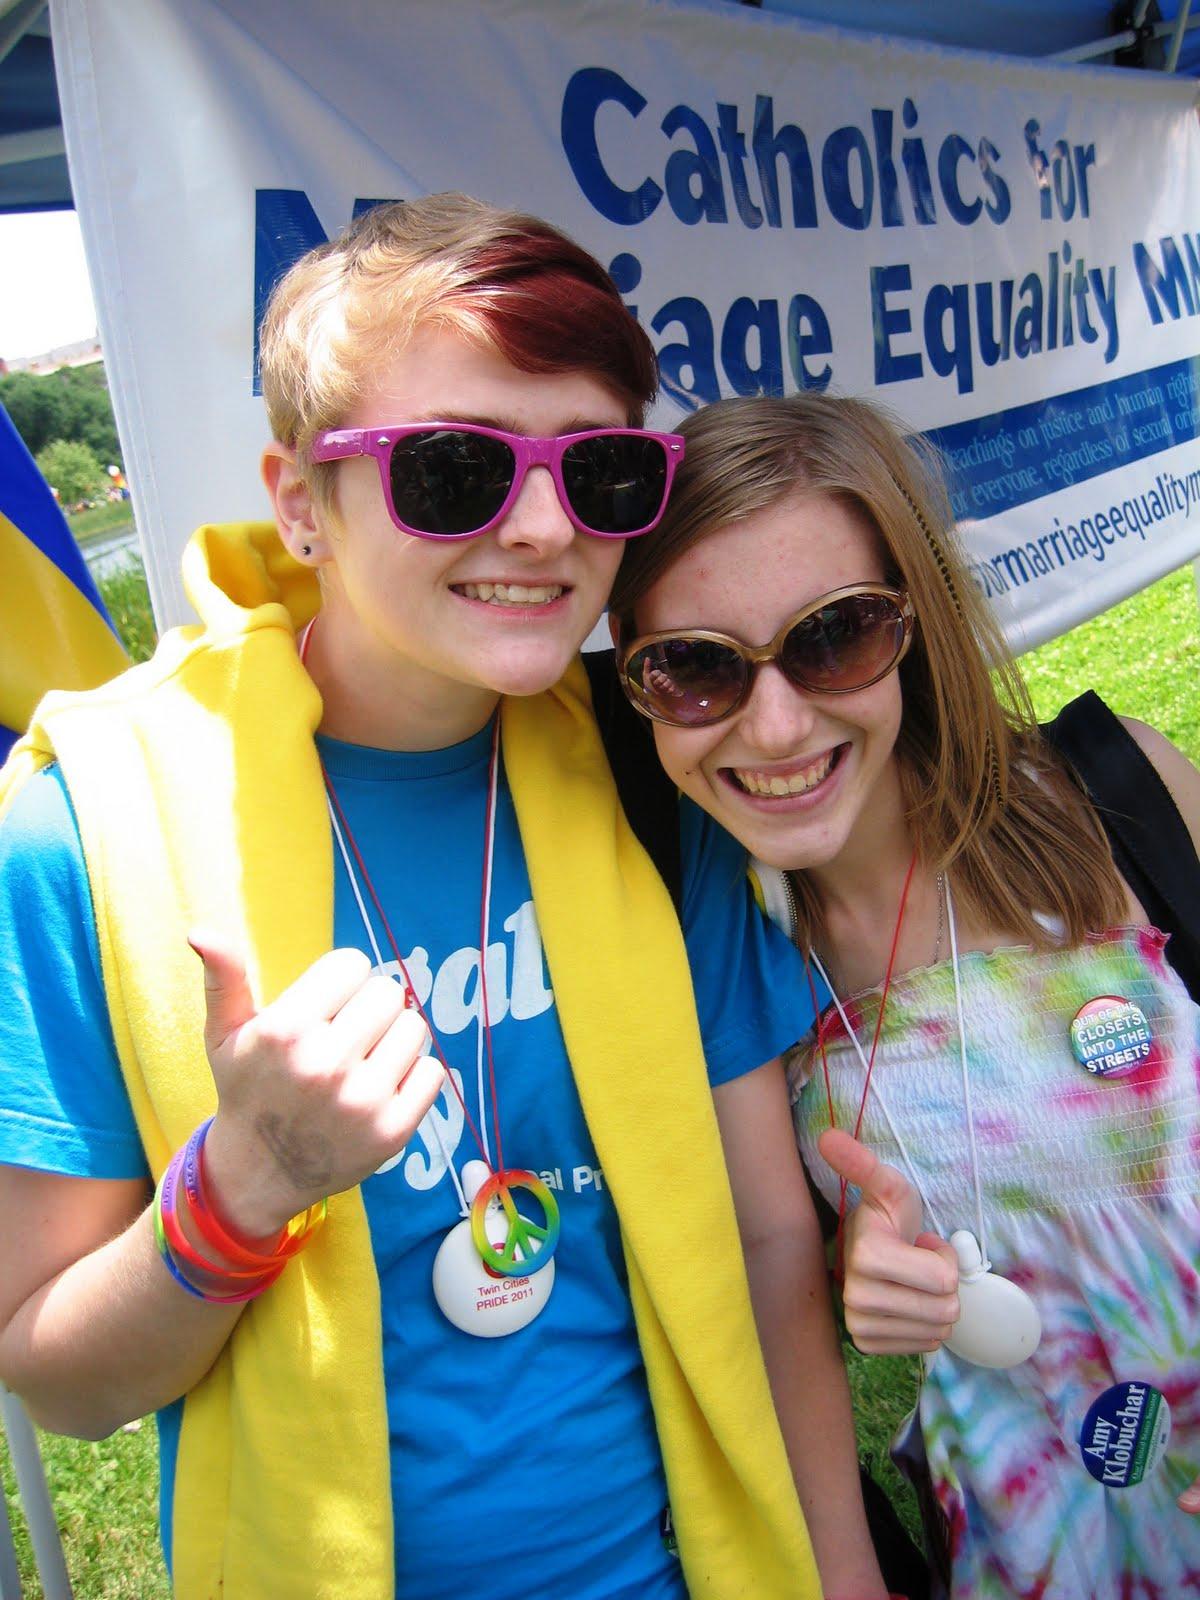 American gay pride 2009